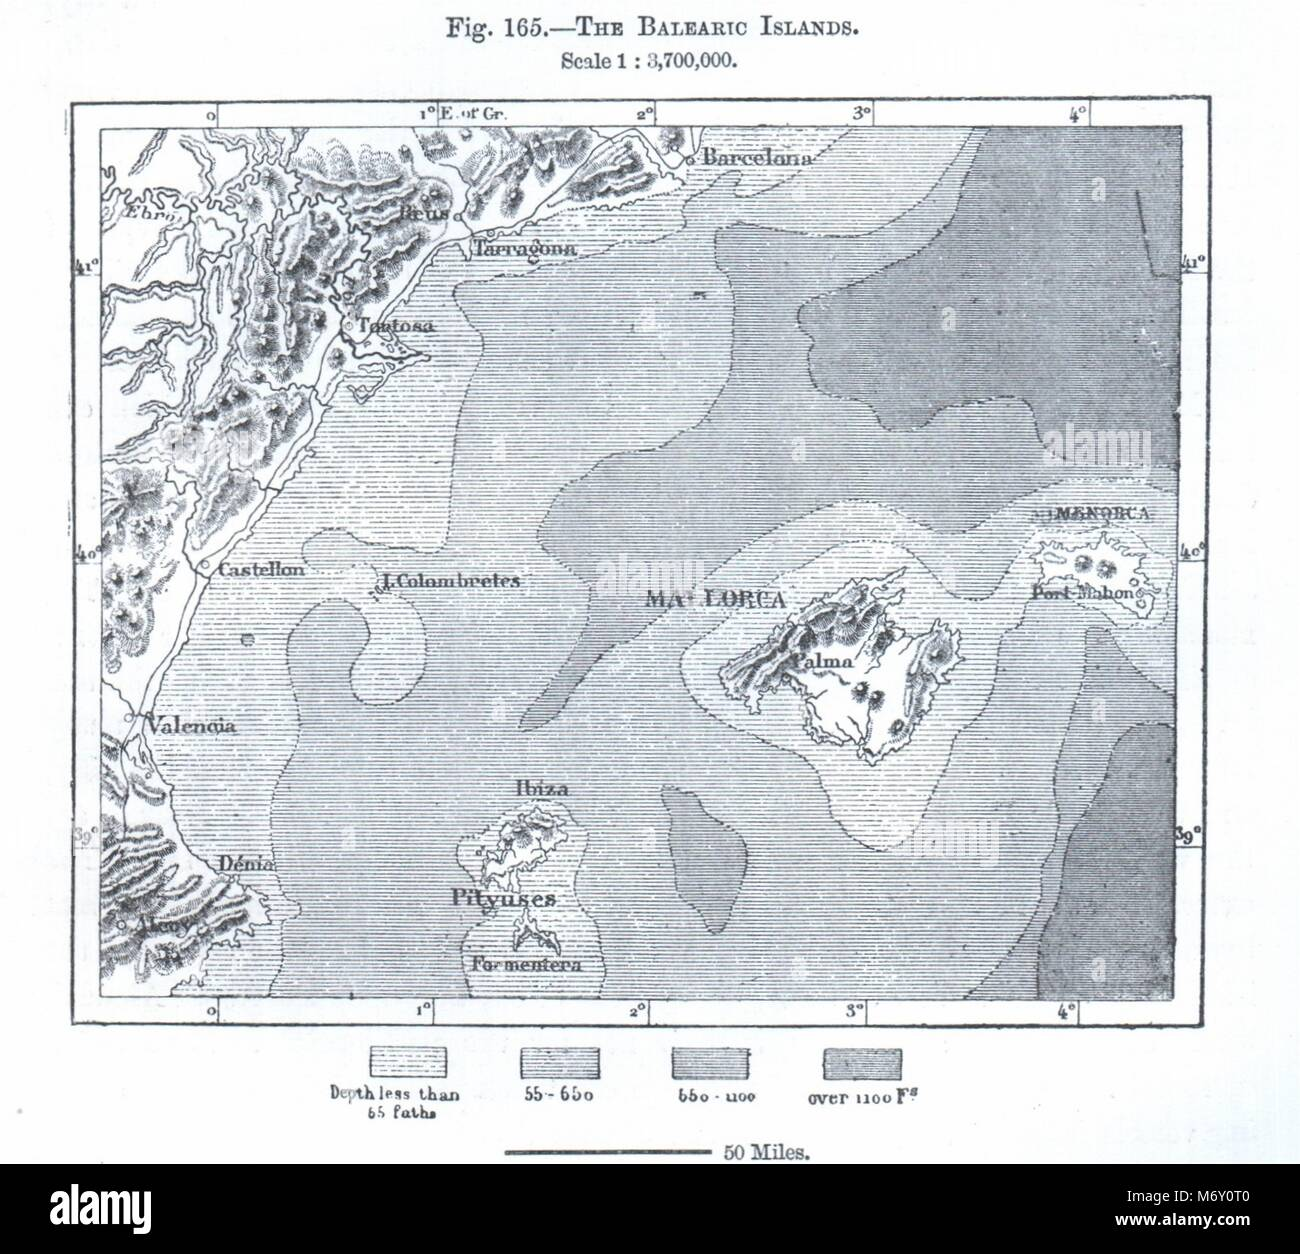 The Balearic Islands Majorca Ibiza Menorca Spain Sketch Map 1885